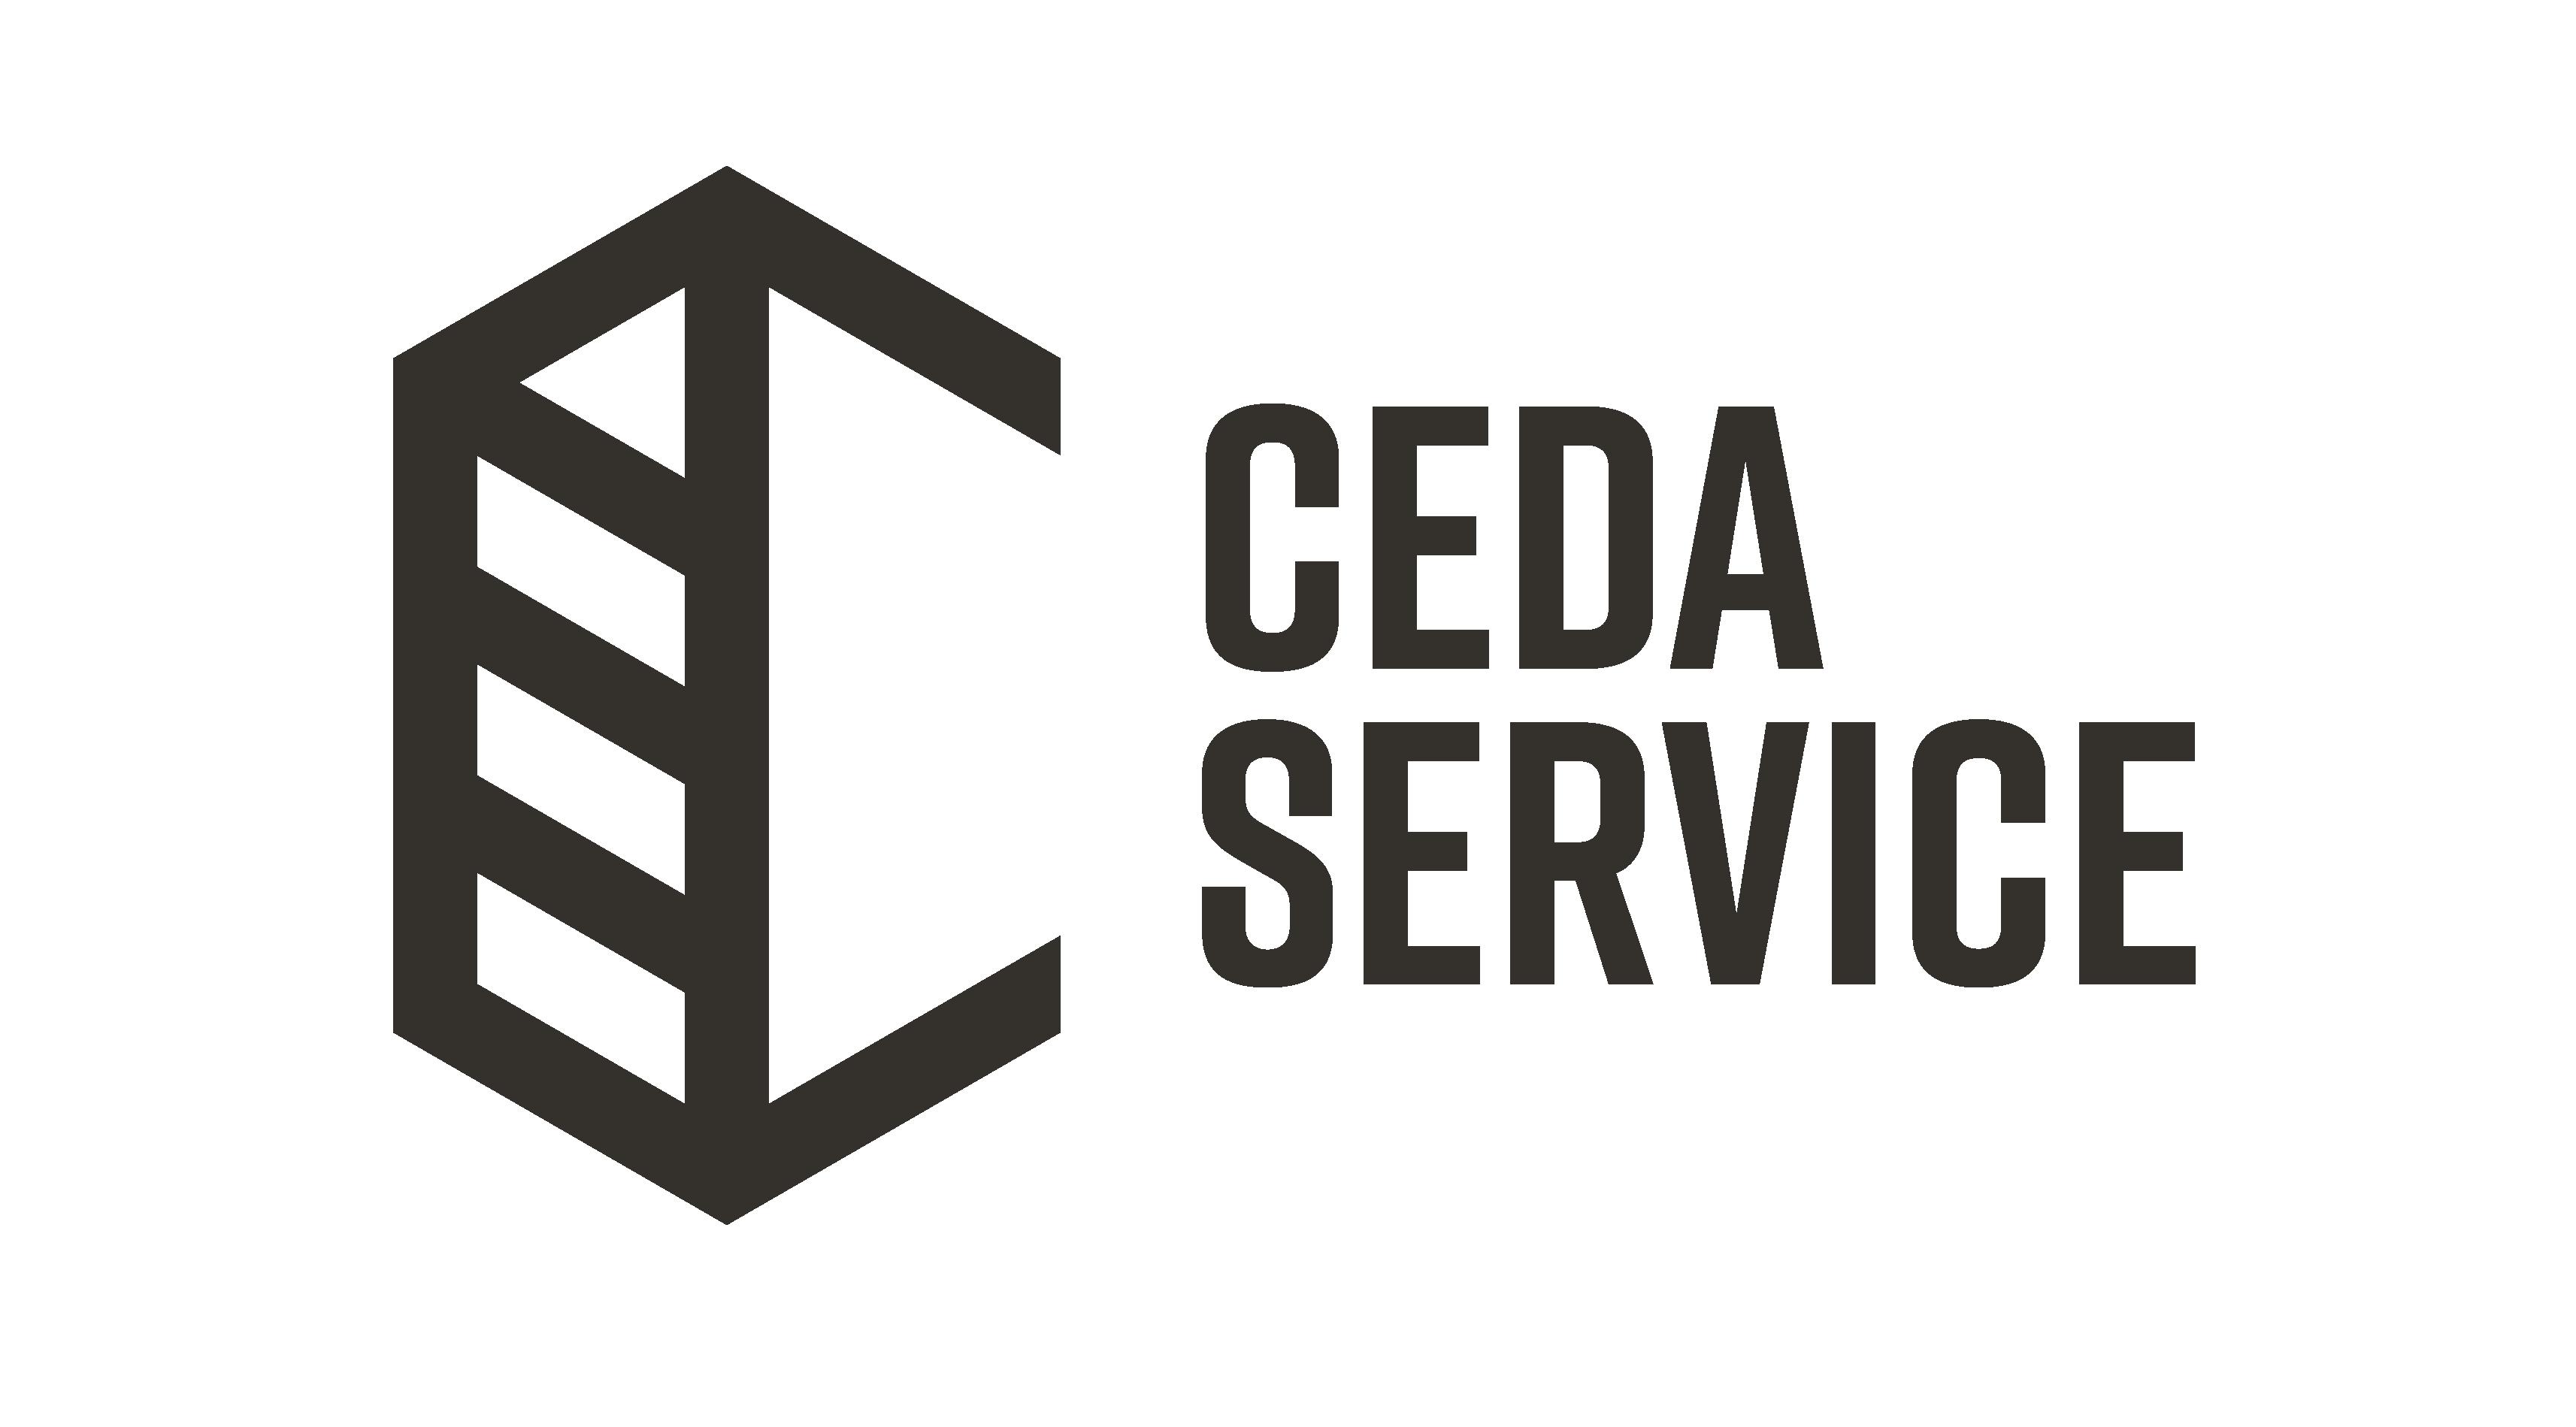 Ceda Service